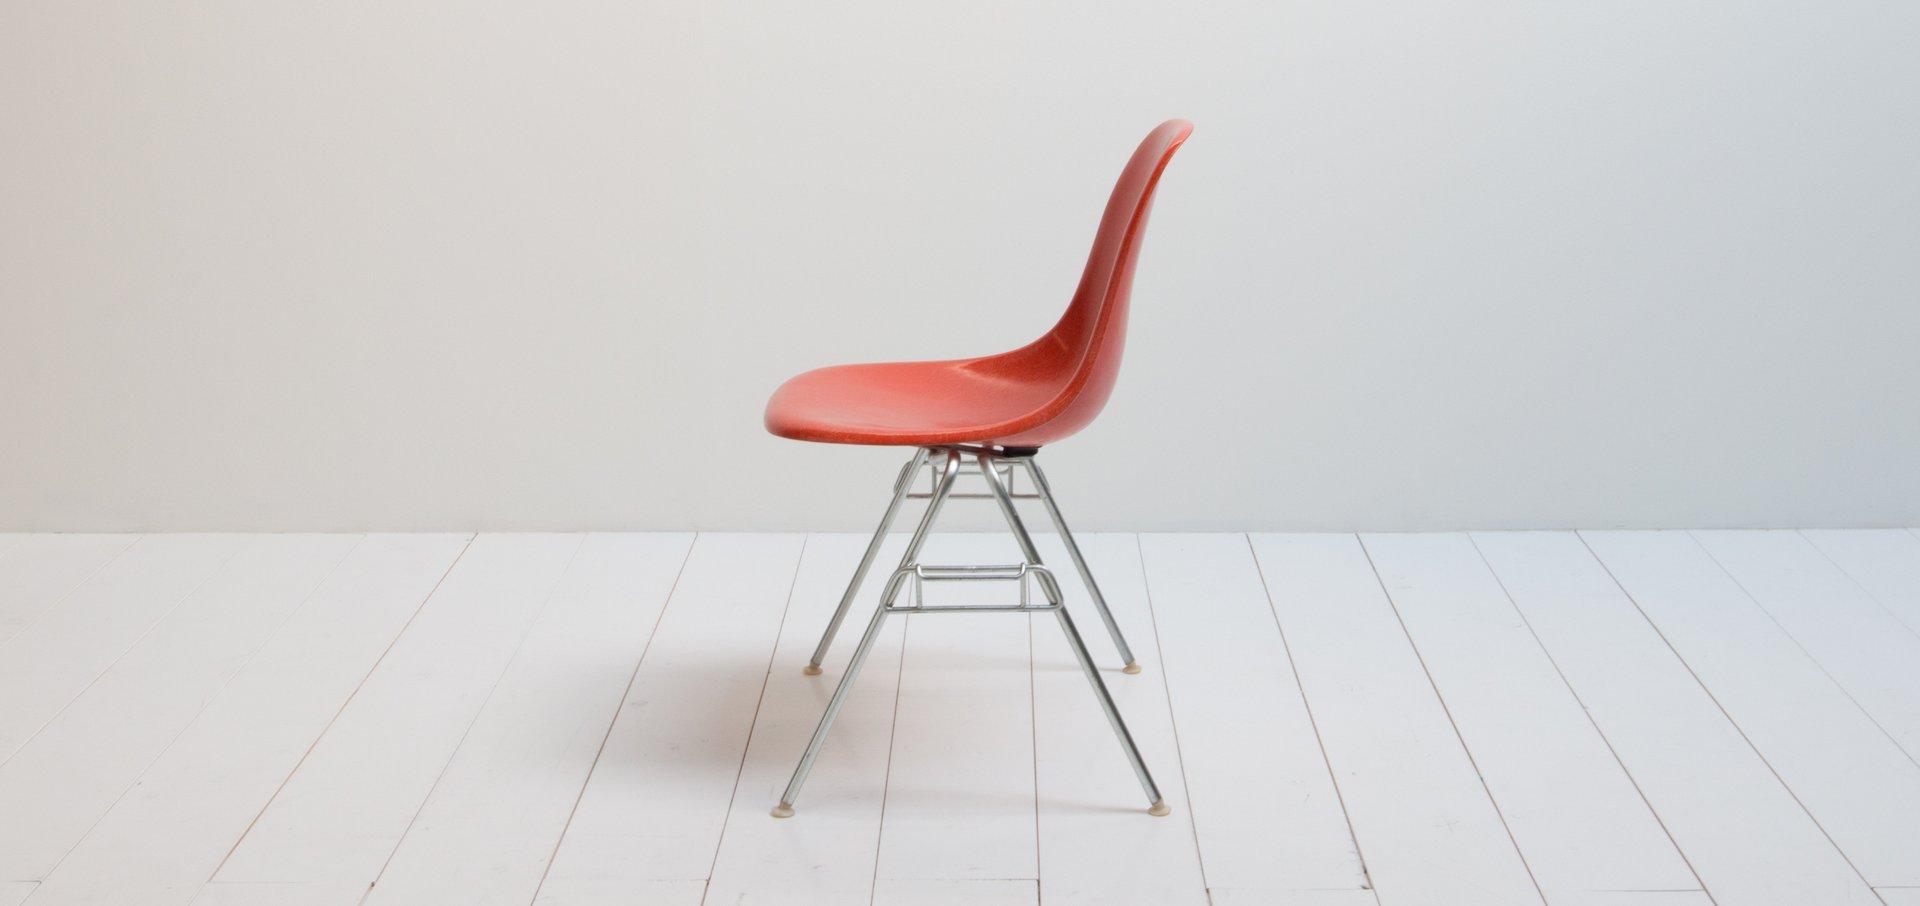 roter vintage dss stuhl von charles ray eames f r herman miller bei pamono kaufen. Black Bedroom Furniture Sets. Home Design Ideas